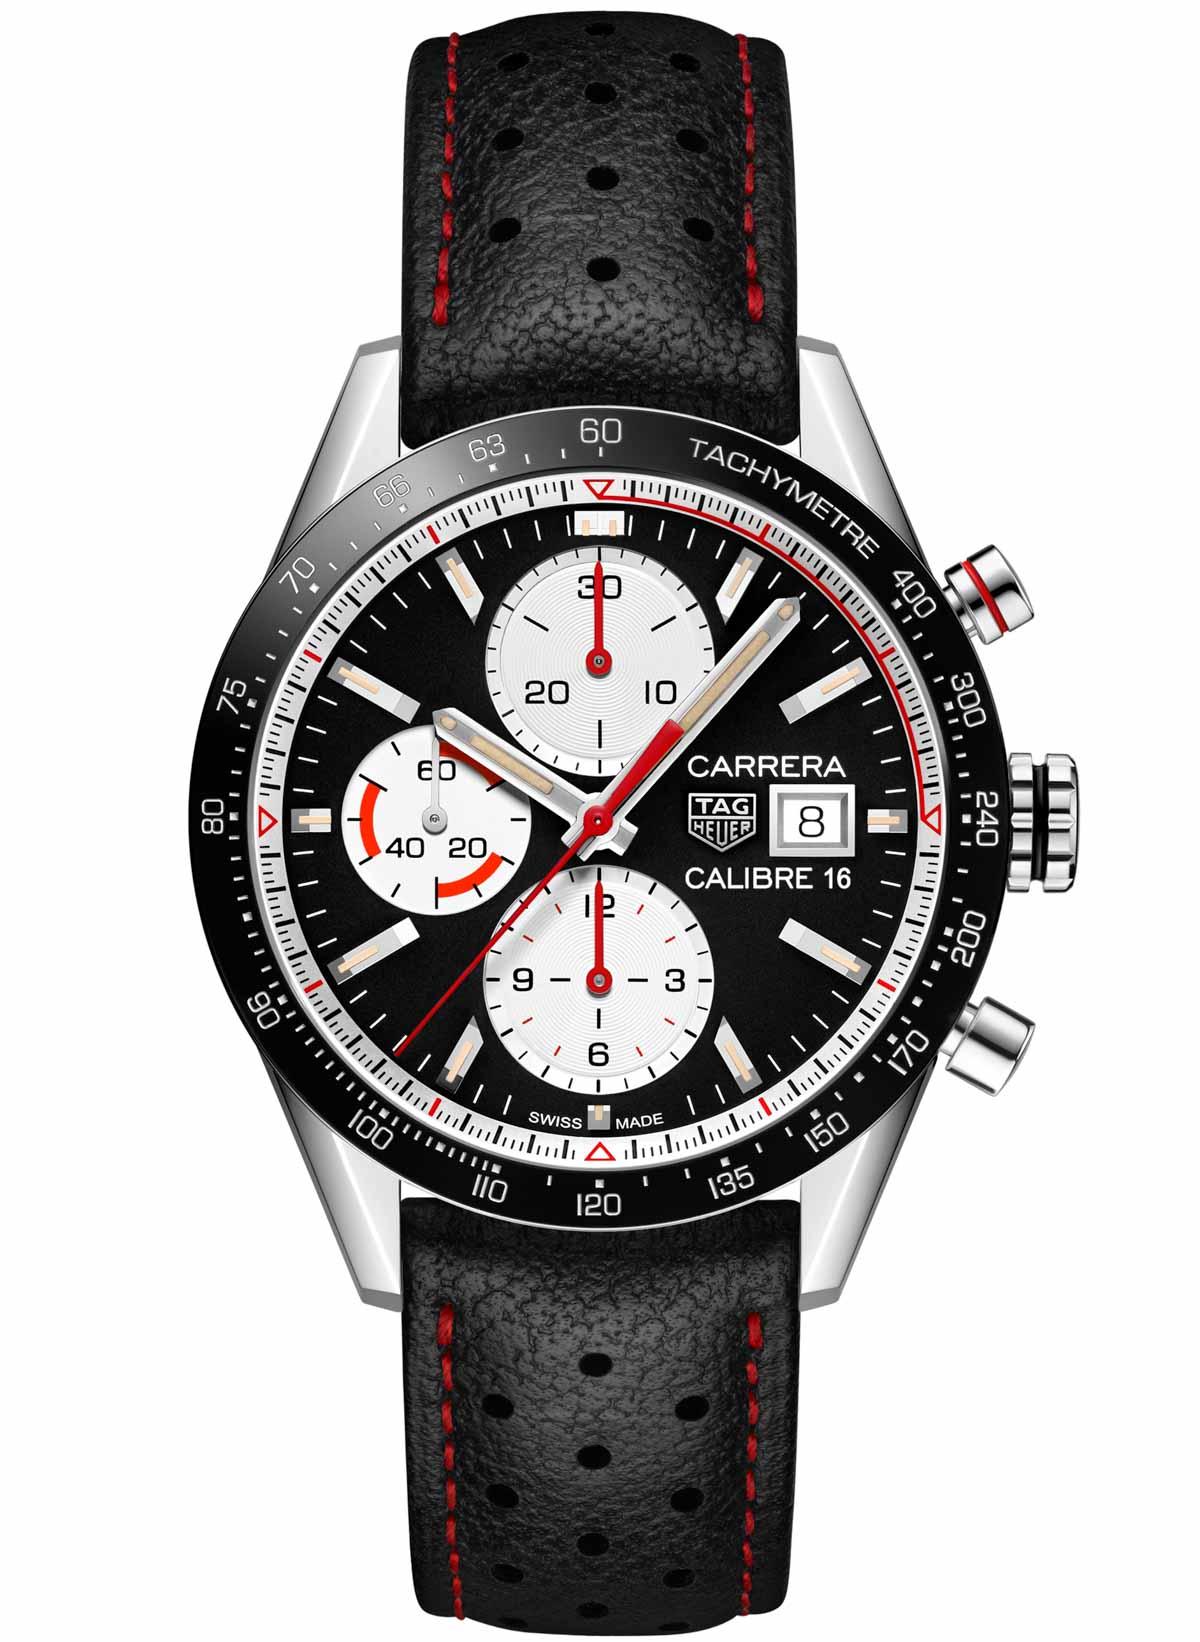 tag-heuer-carrera-calibre-16-chronograph-orasblog-karora-svajciora-luxus-ora-kronograf-1.jpg